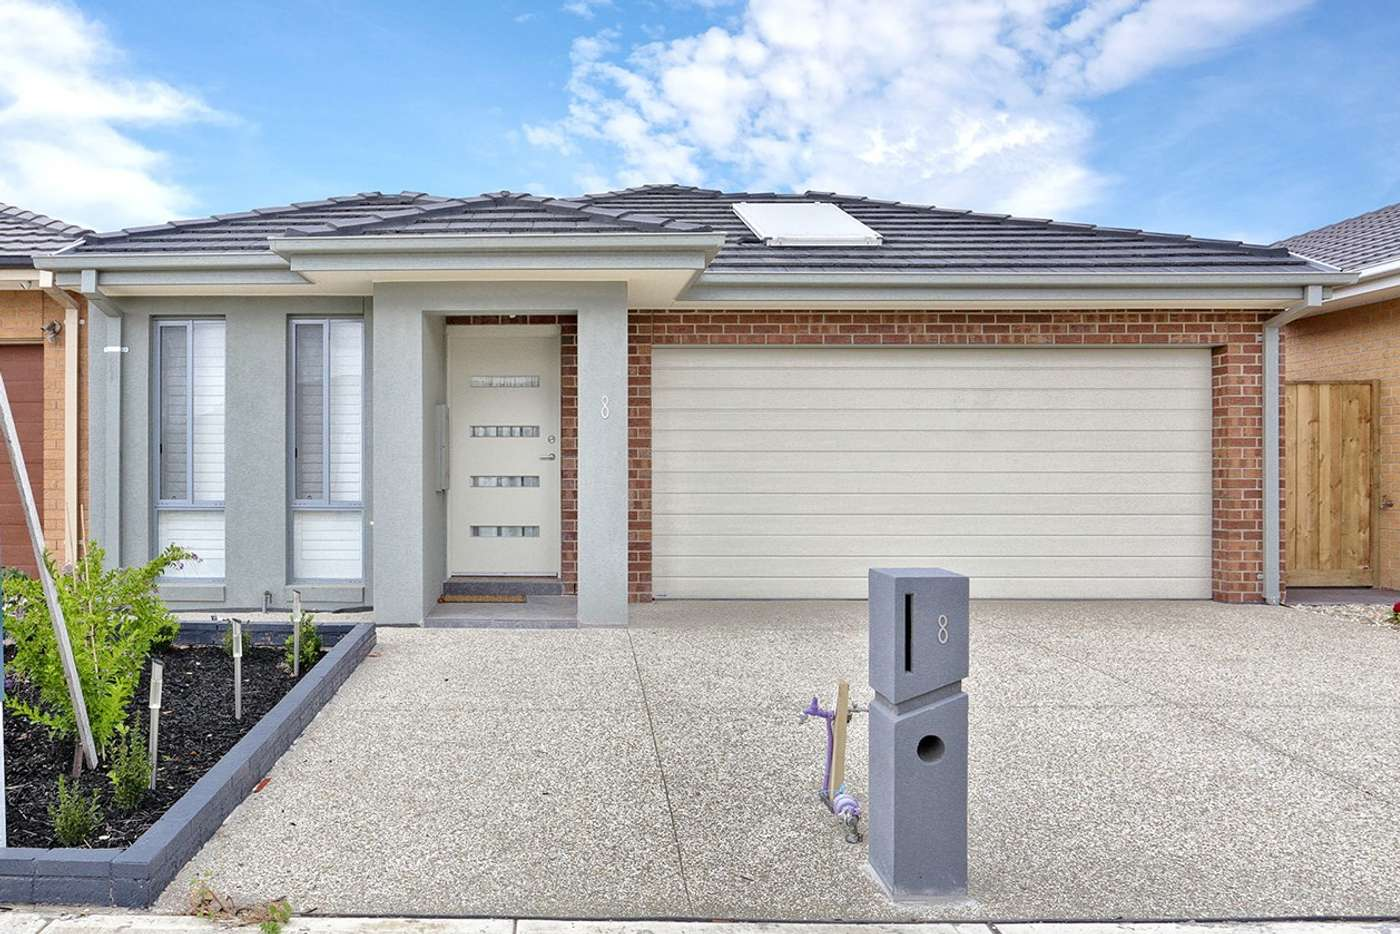 Main view of Homely house listing, 8 Dahlia Crescent, Keysborough VIC 3173